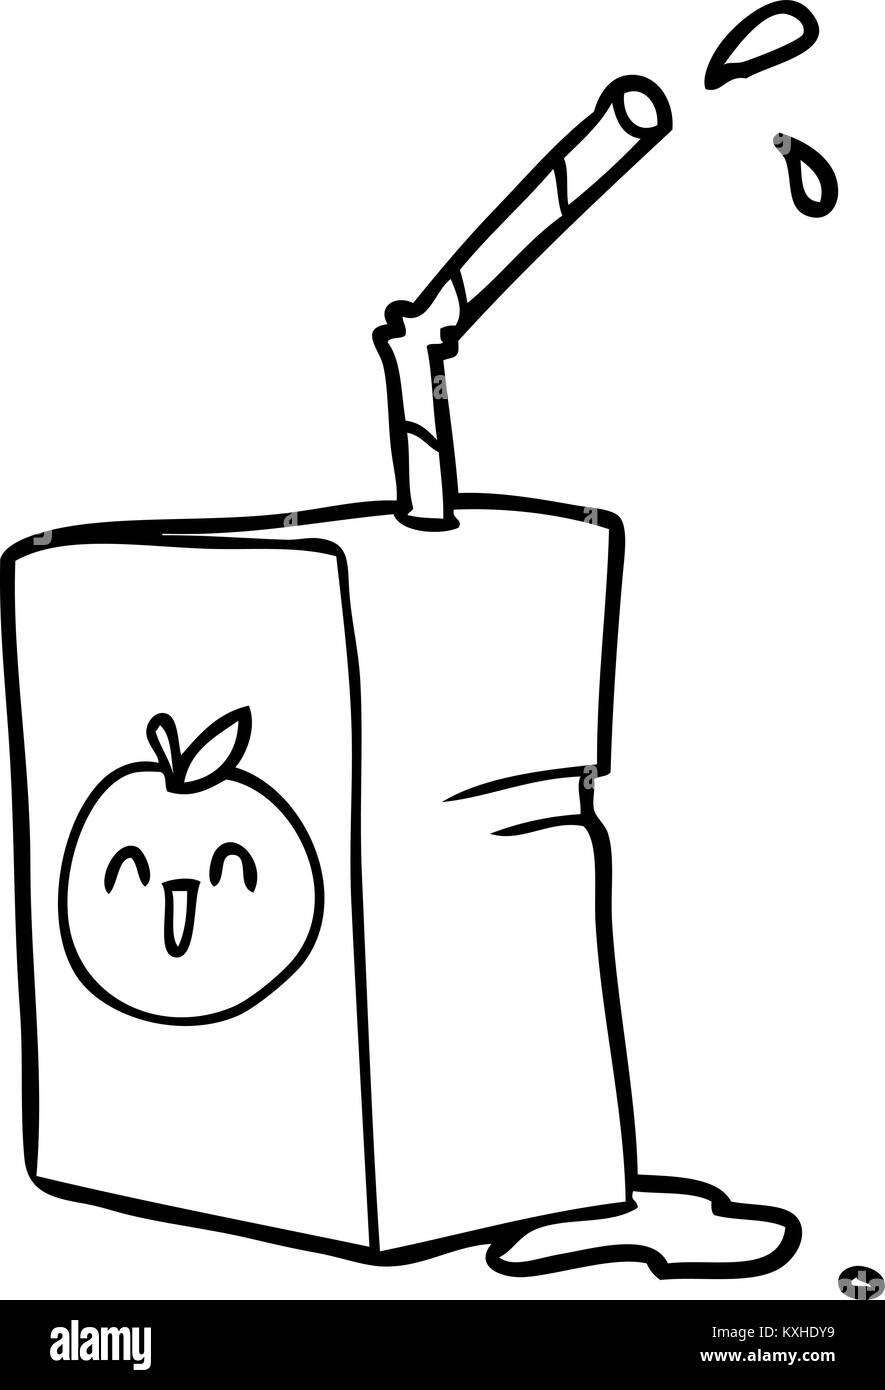 Line Art Juice : Line drawing of a apple juice box stock vector art